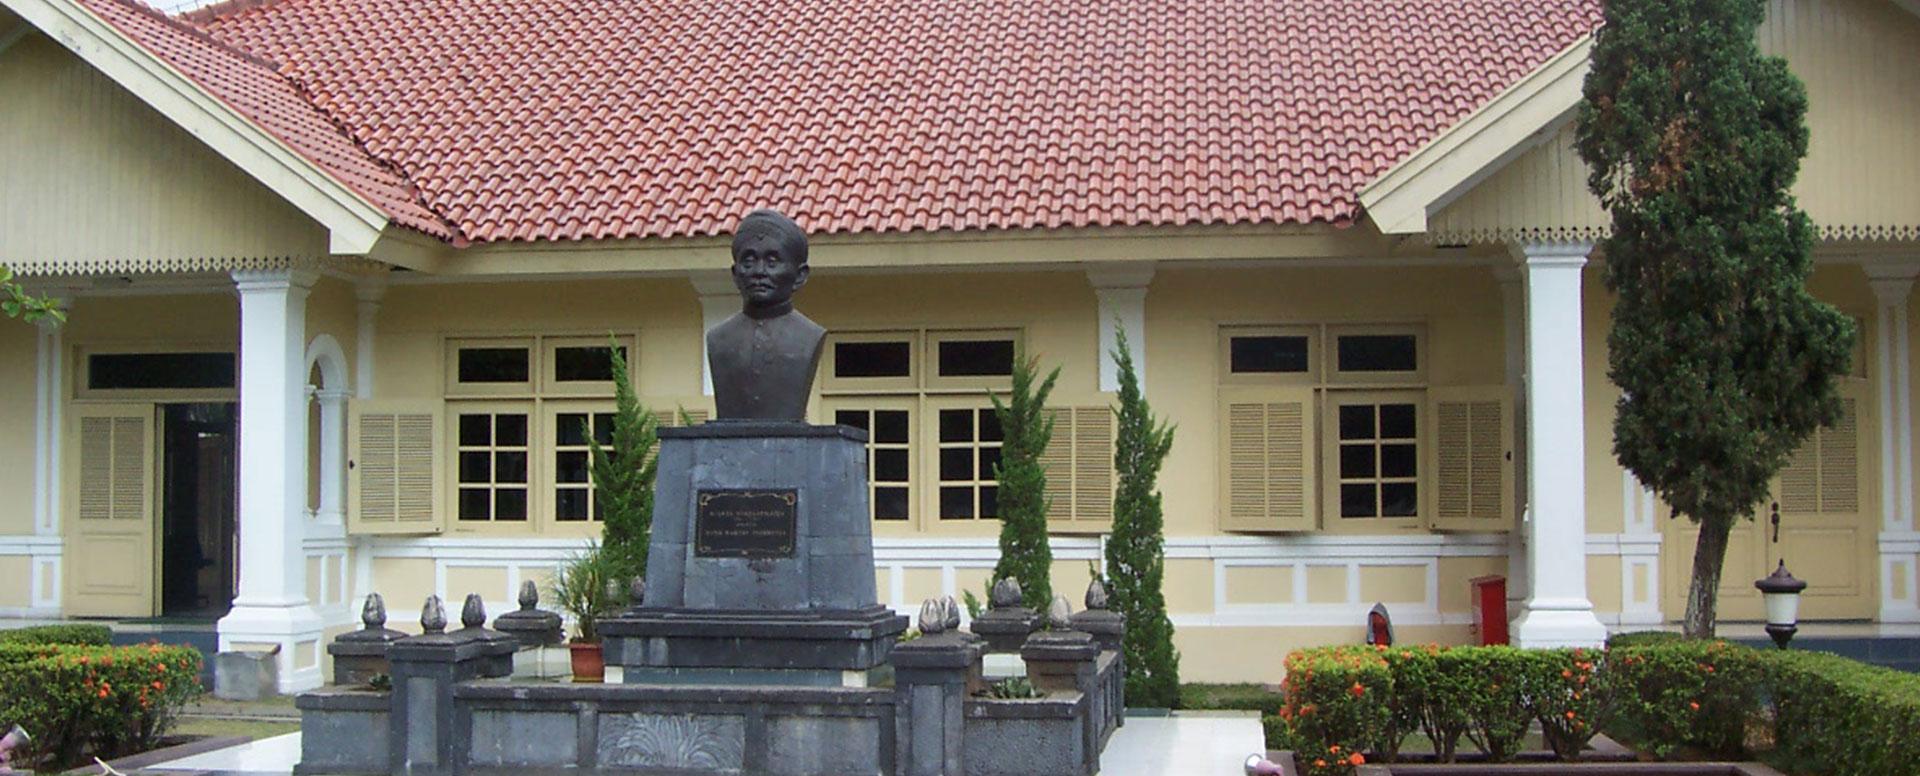 Destinasi Wisata Banyumas 1 2 3 Museum Bank Rakyat Indonesia